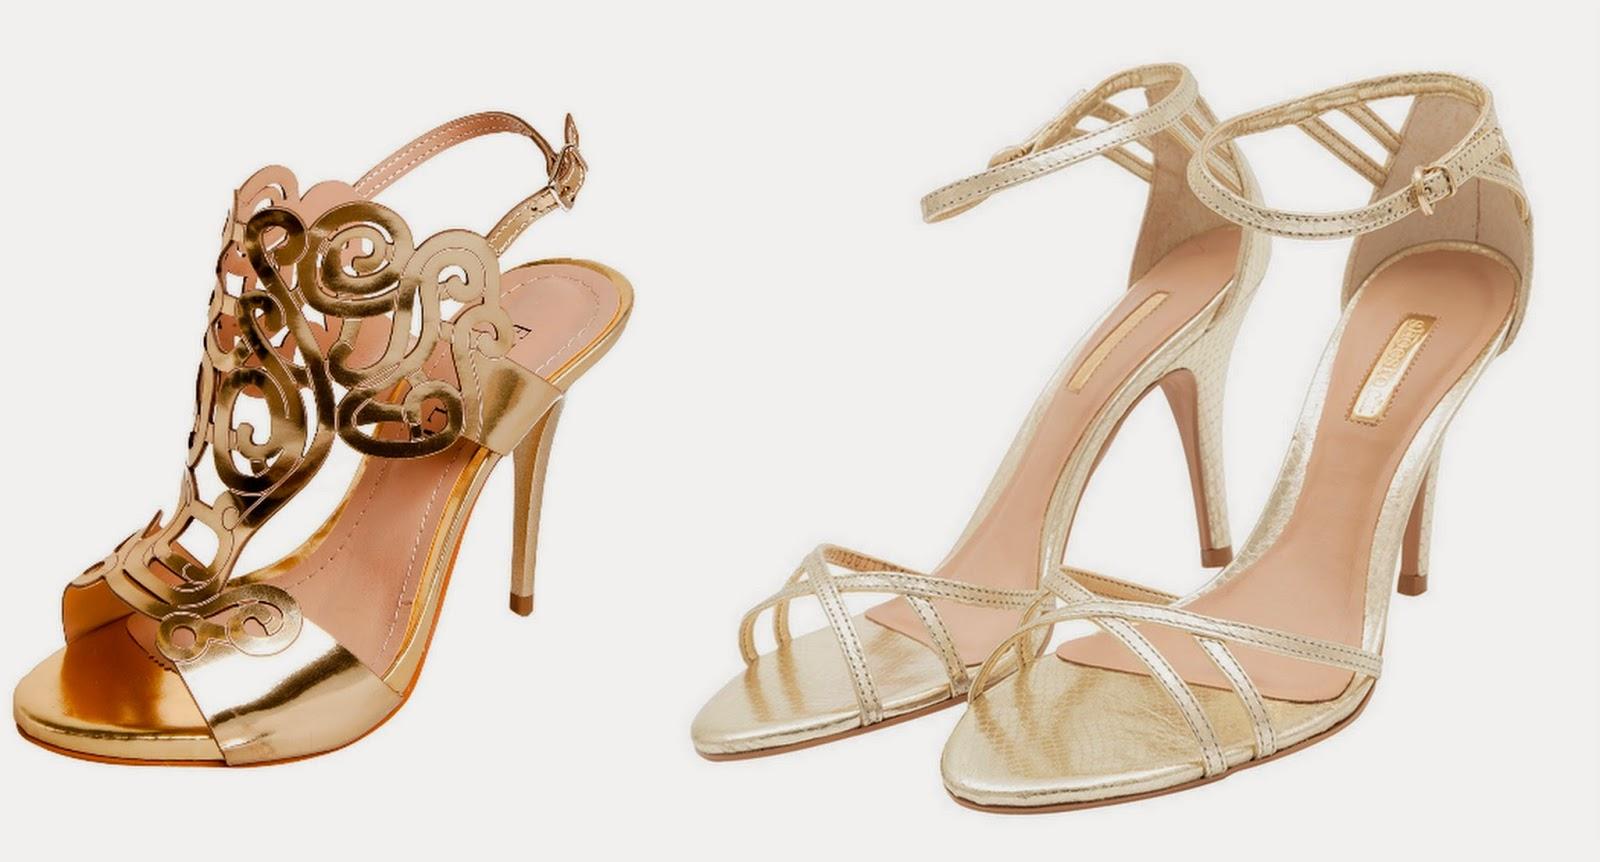 ea8aaa2d4 Sandália FiveBlu Diva Glass dourada,R$ 109,90 (aqui)- Sandália metalizada  textura dourada R$ 119,00 (aqui)